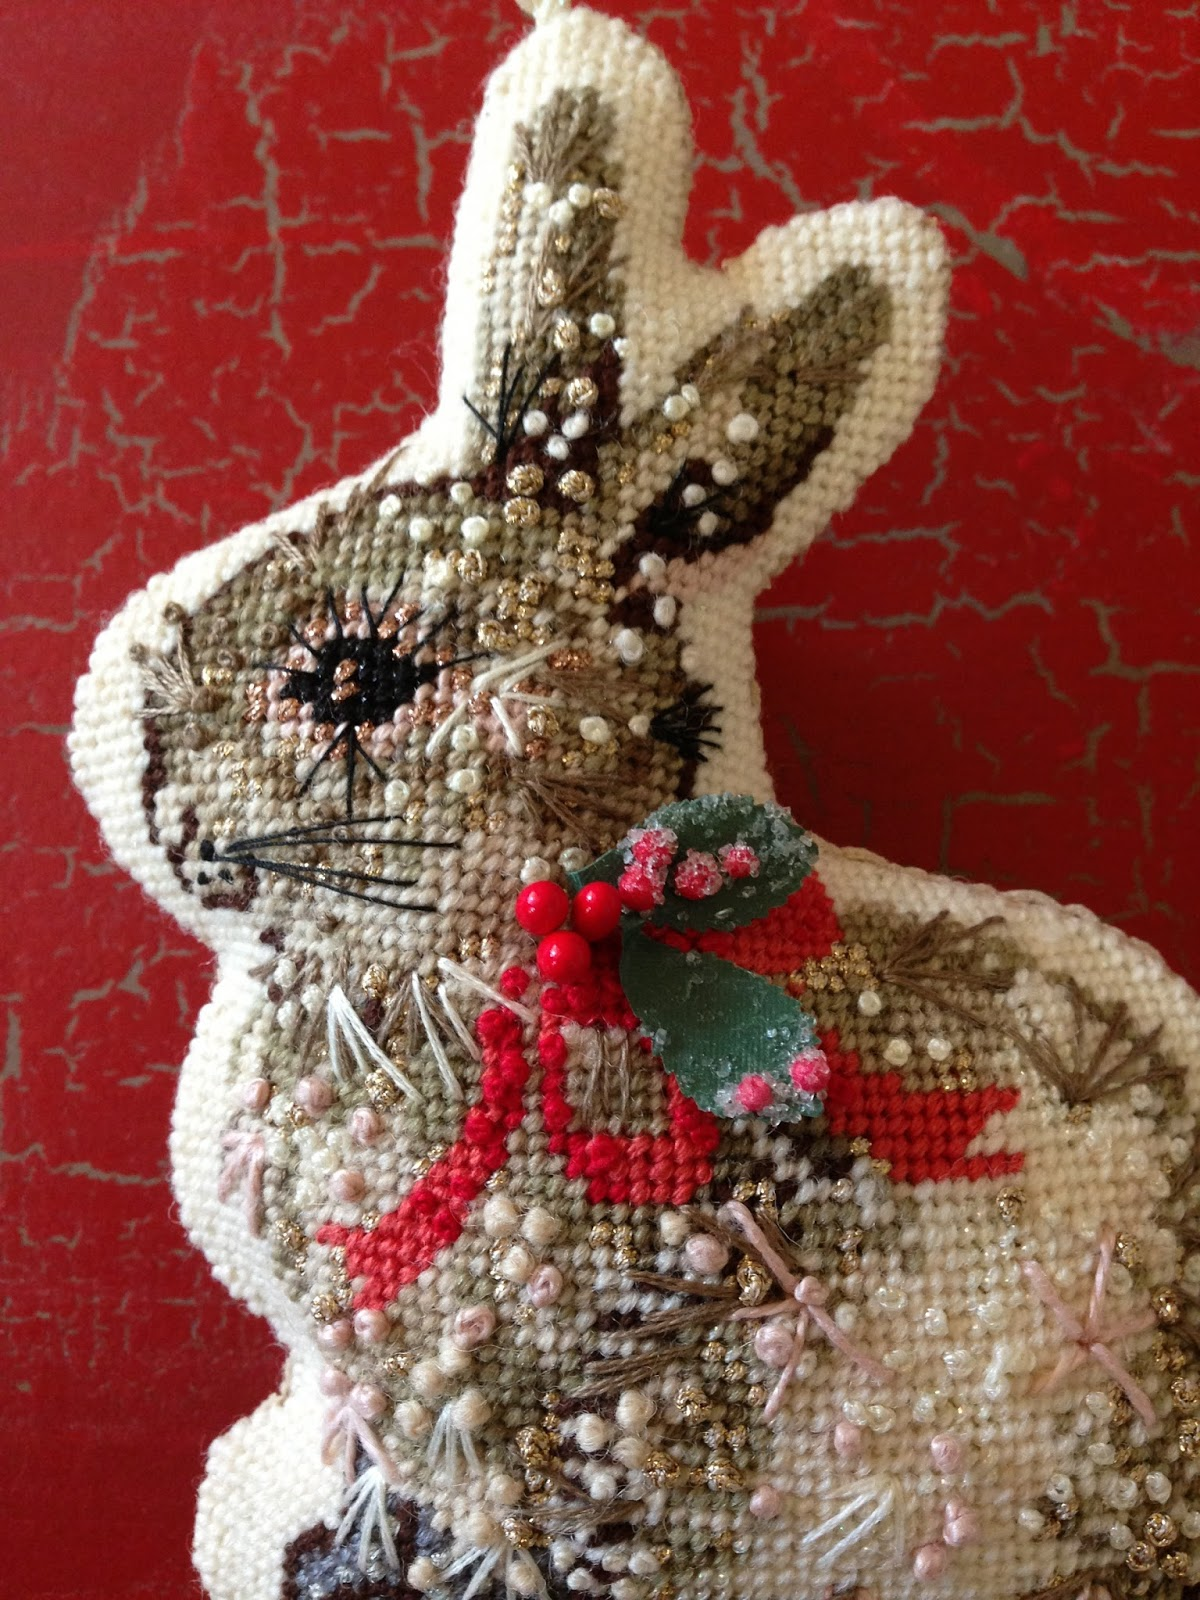 Needlepoint Christmas Stocking Tutorial - Knitionary